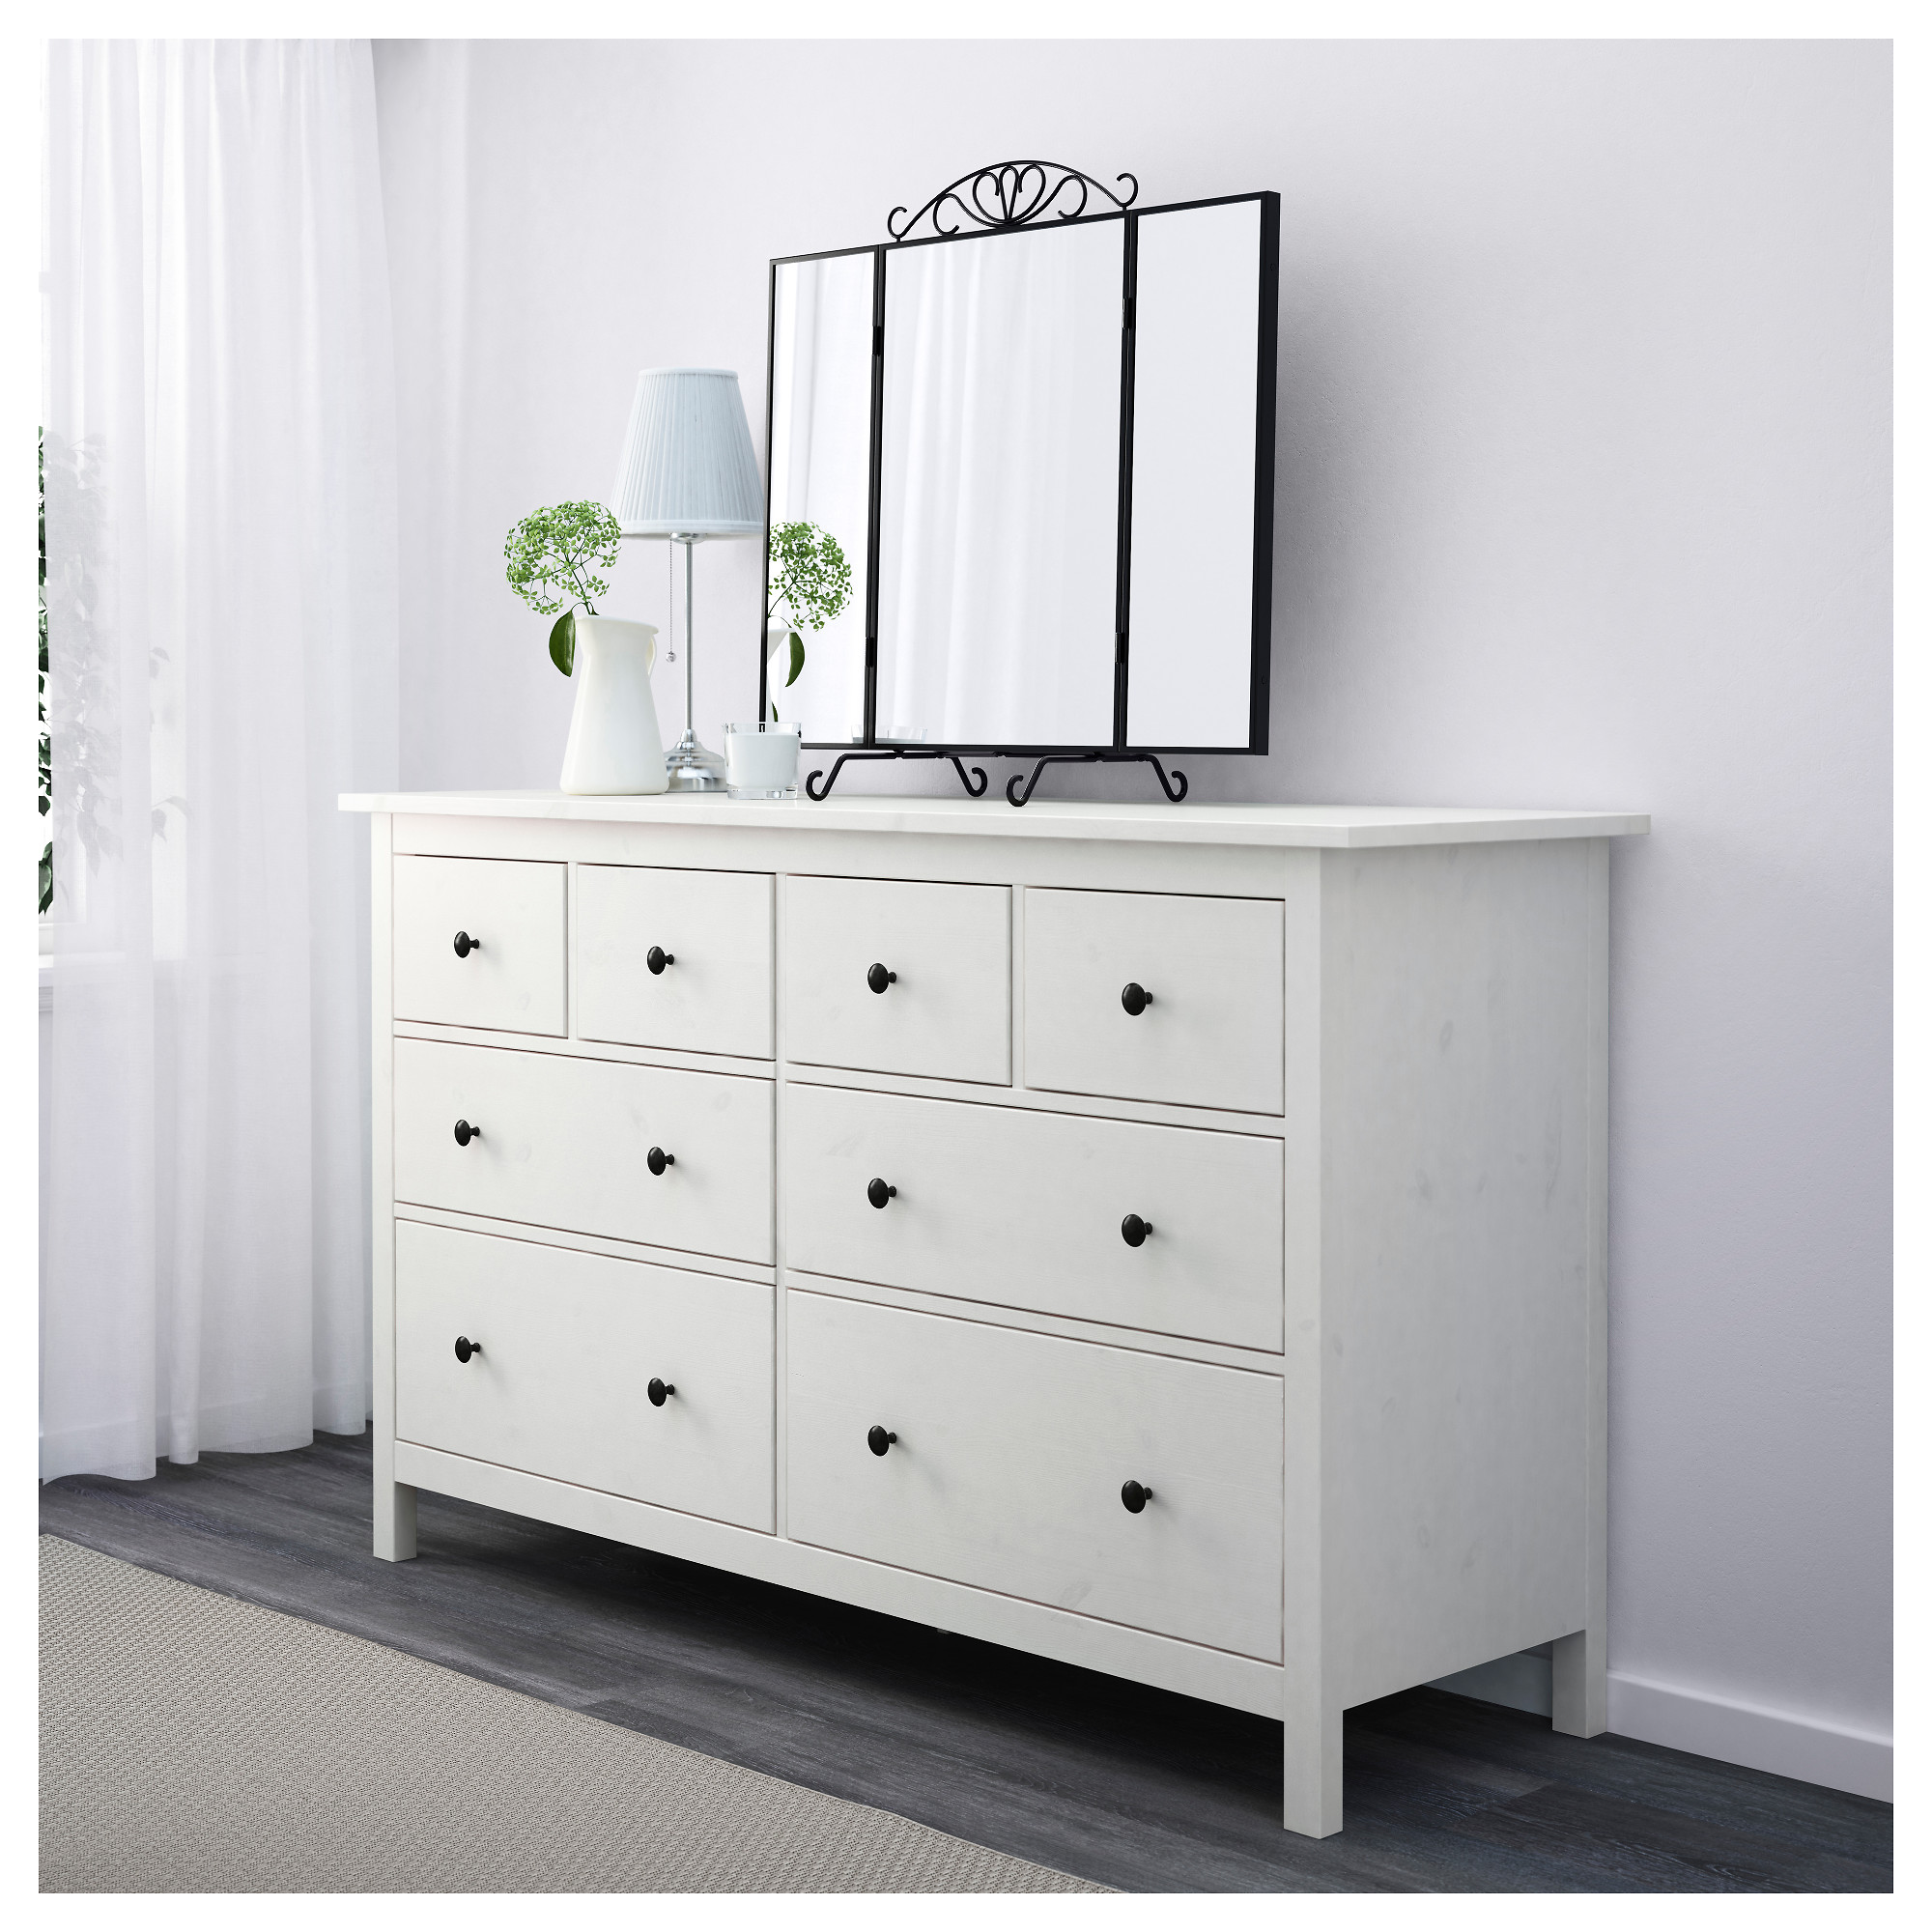 buy online 7e041 df9bd HEMNES - chest of 8 drawers, white stain | IKEA Hong Kong